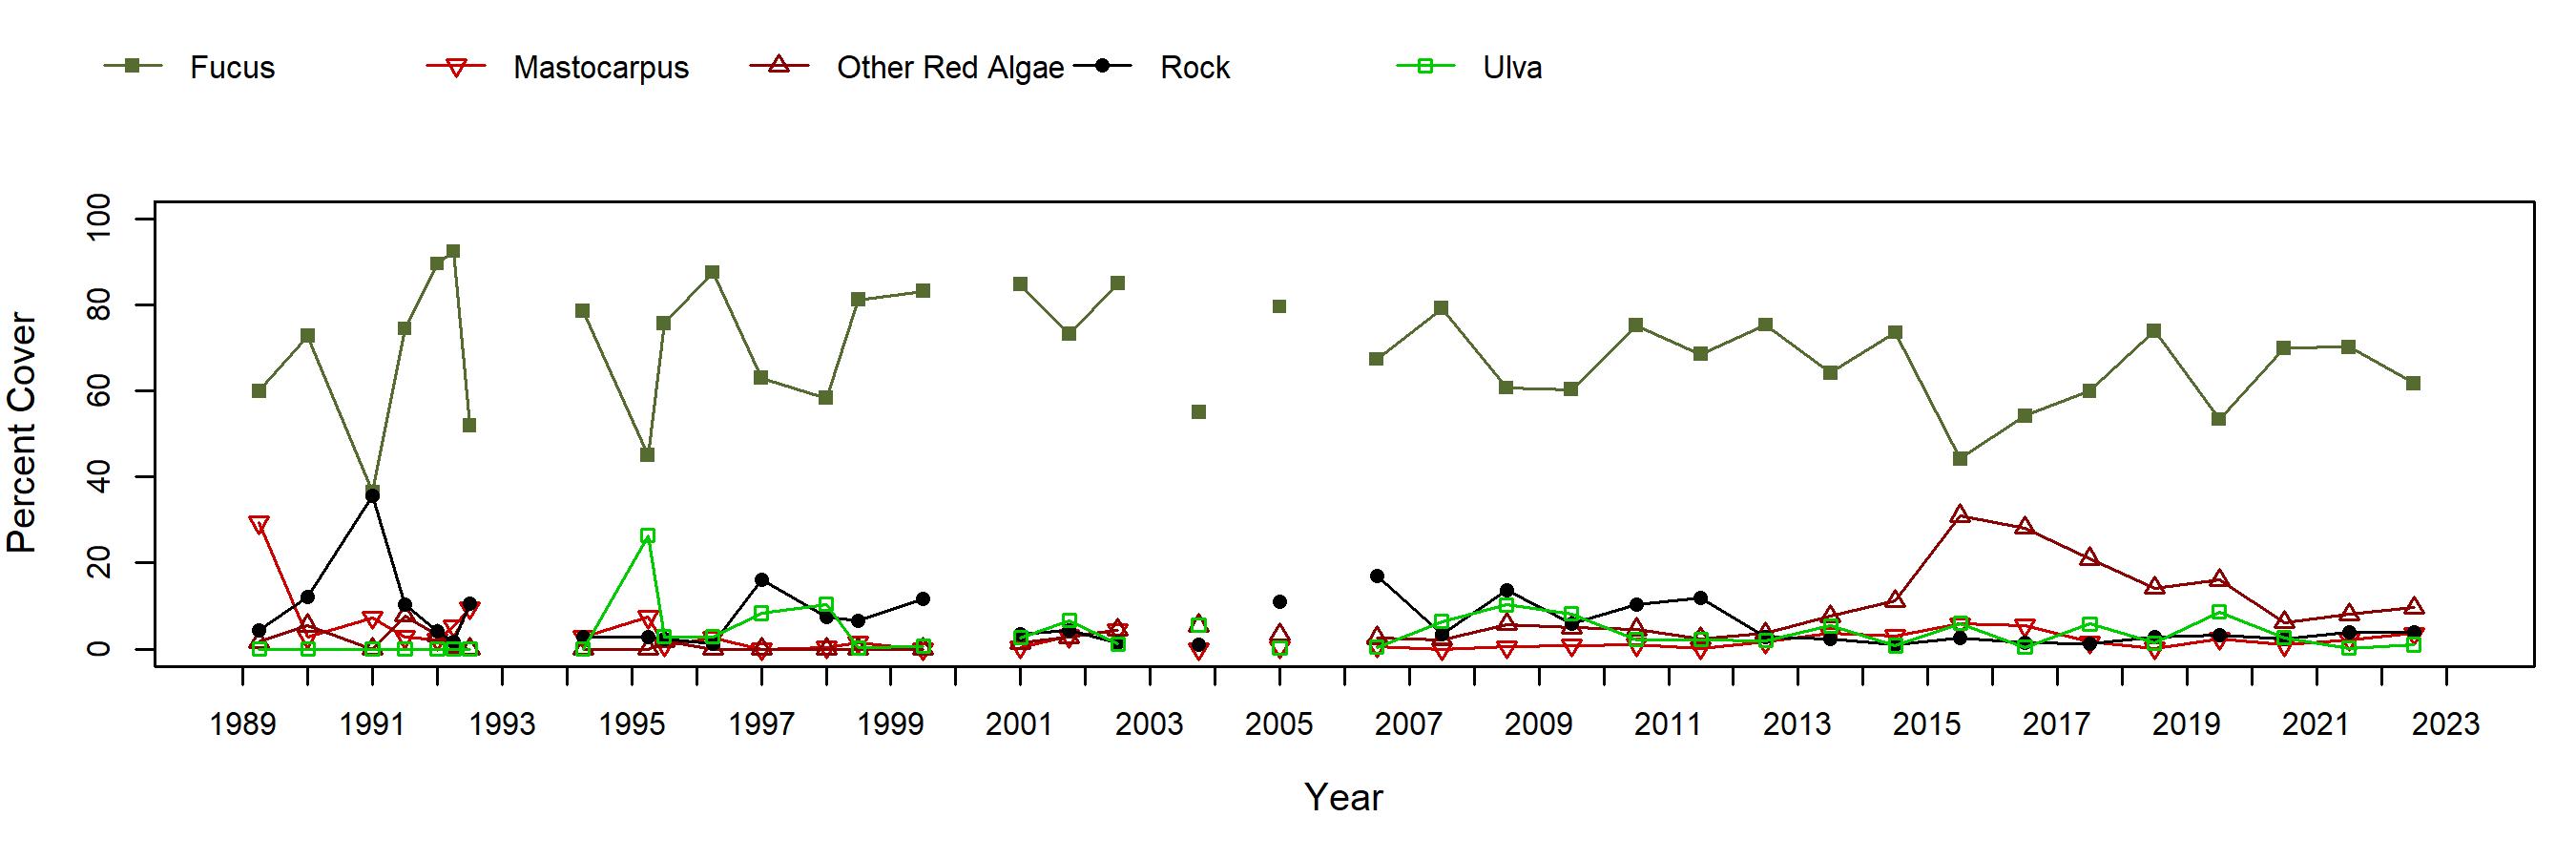 Alcatraz Fucus trend plot